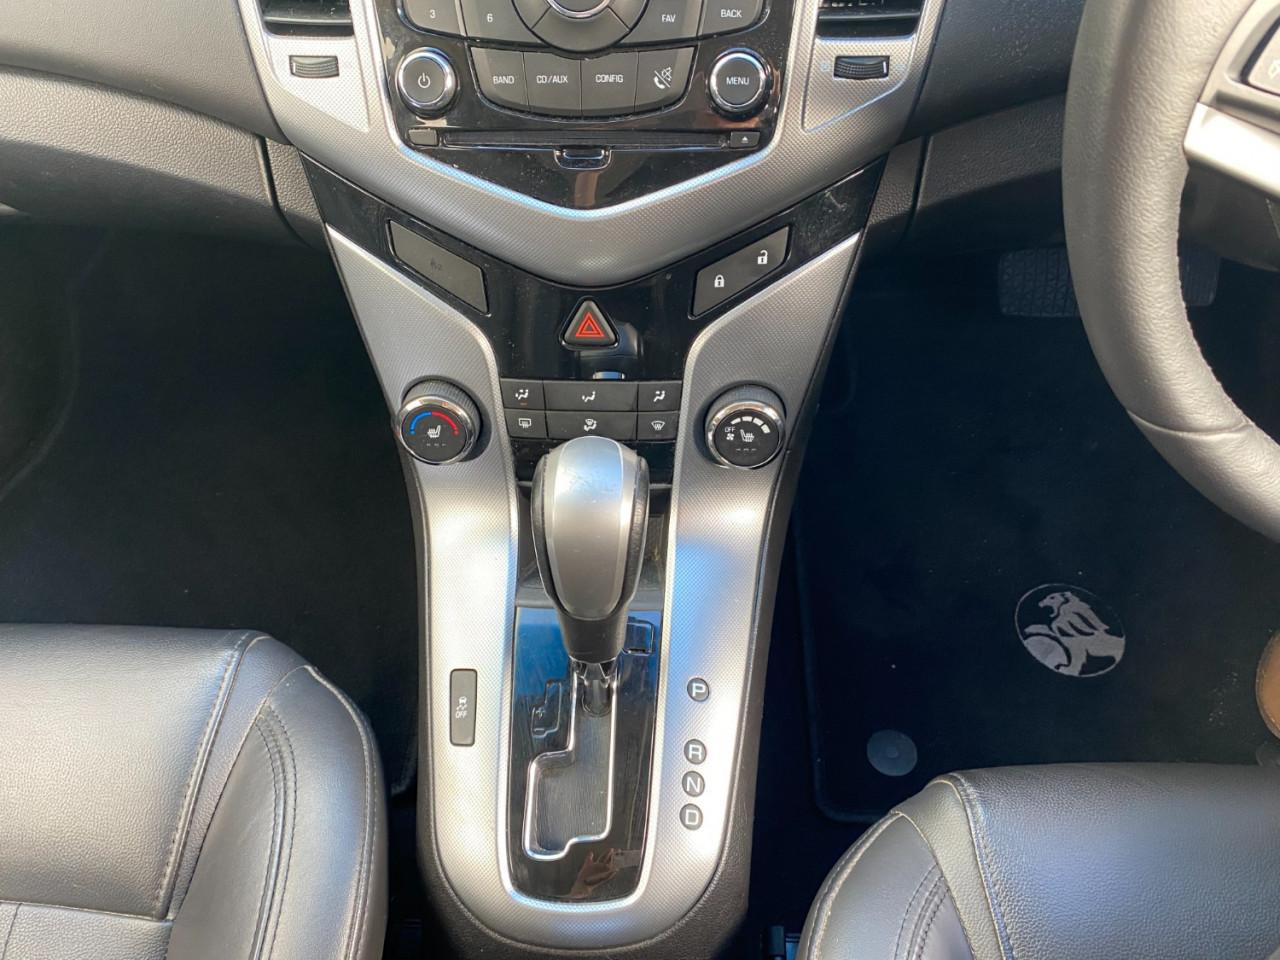 2012 Holden Cruze JH SERIES II MY12 CDX Hatchback Image 11